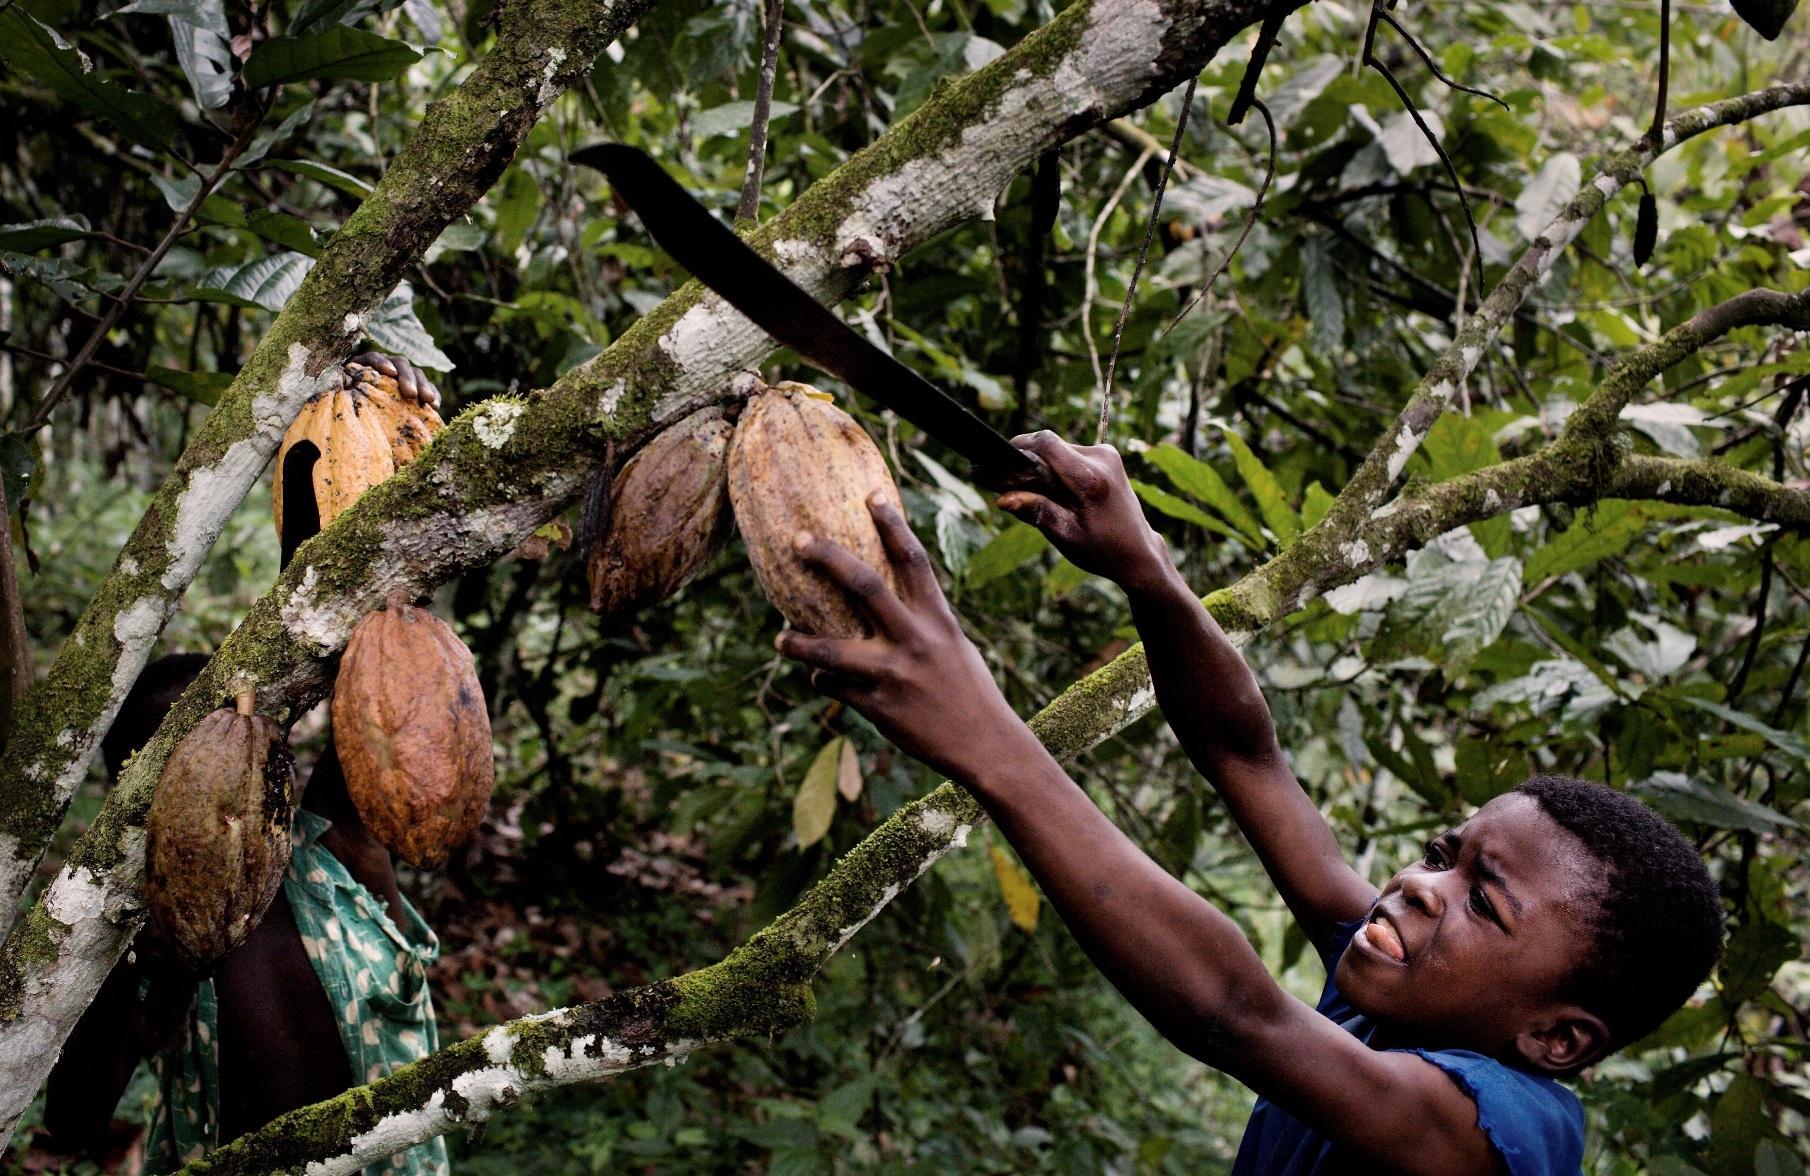 Child Labor: The Dark Side of Chocolate | WilderUtopia.com